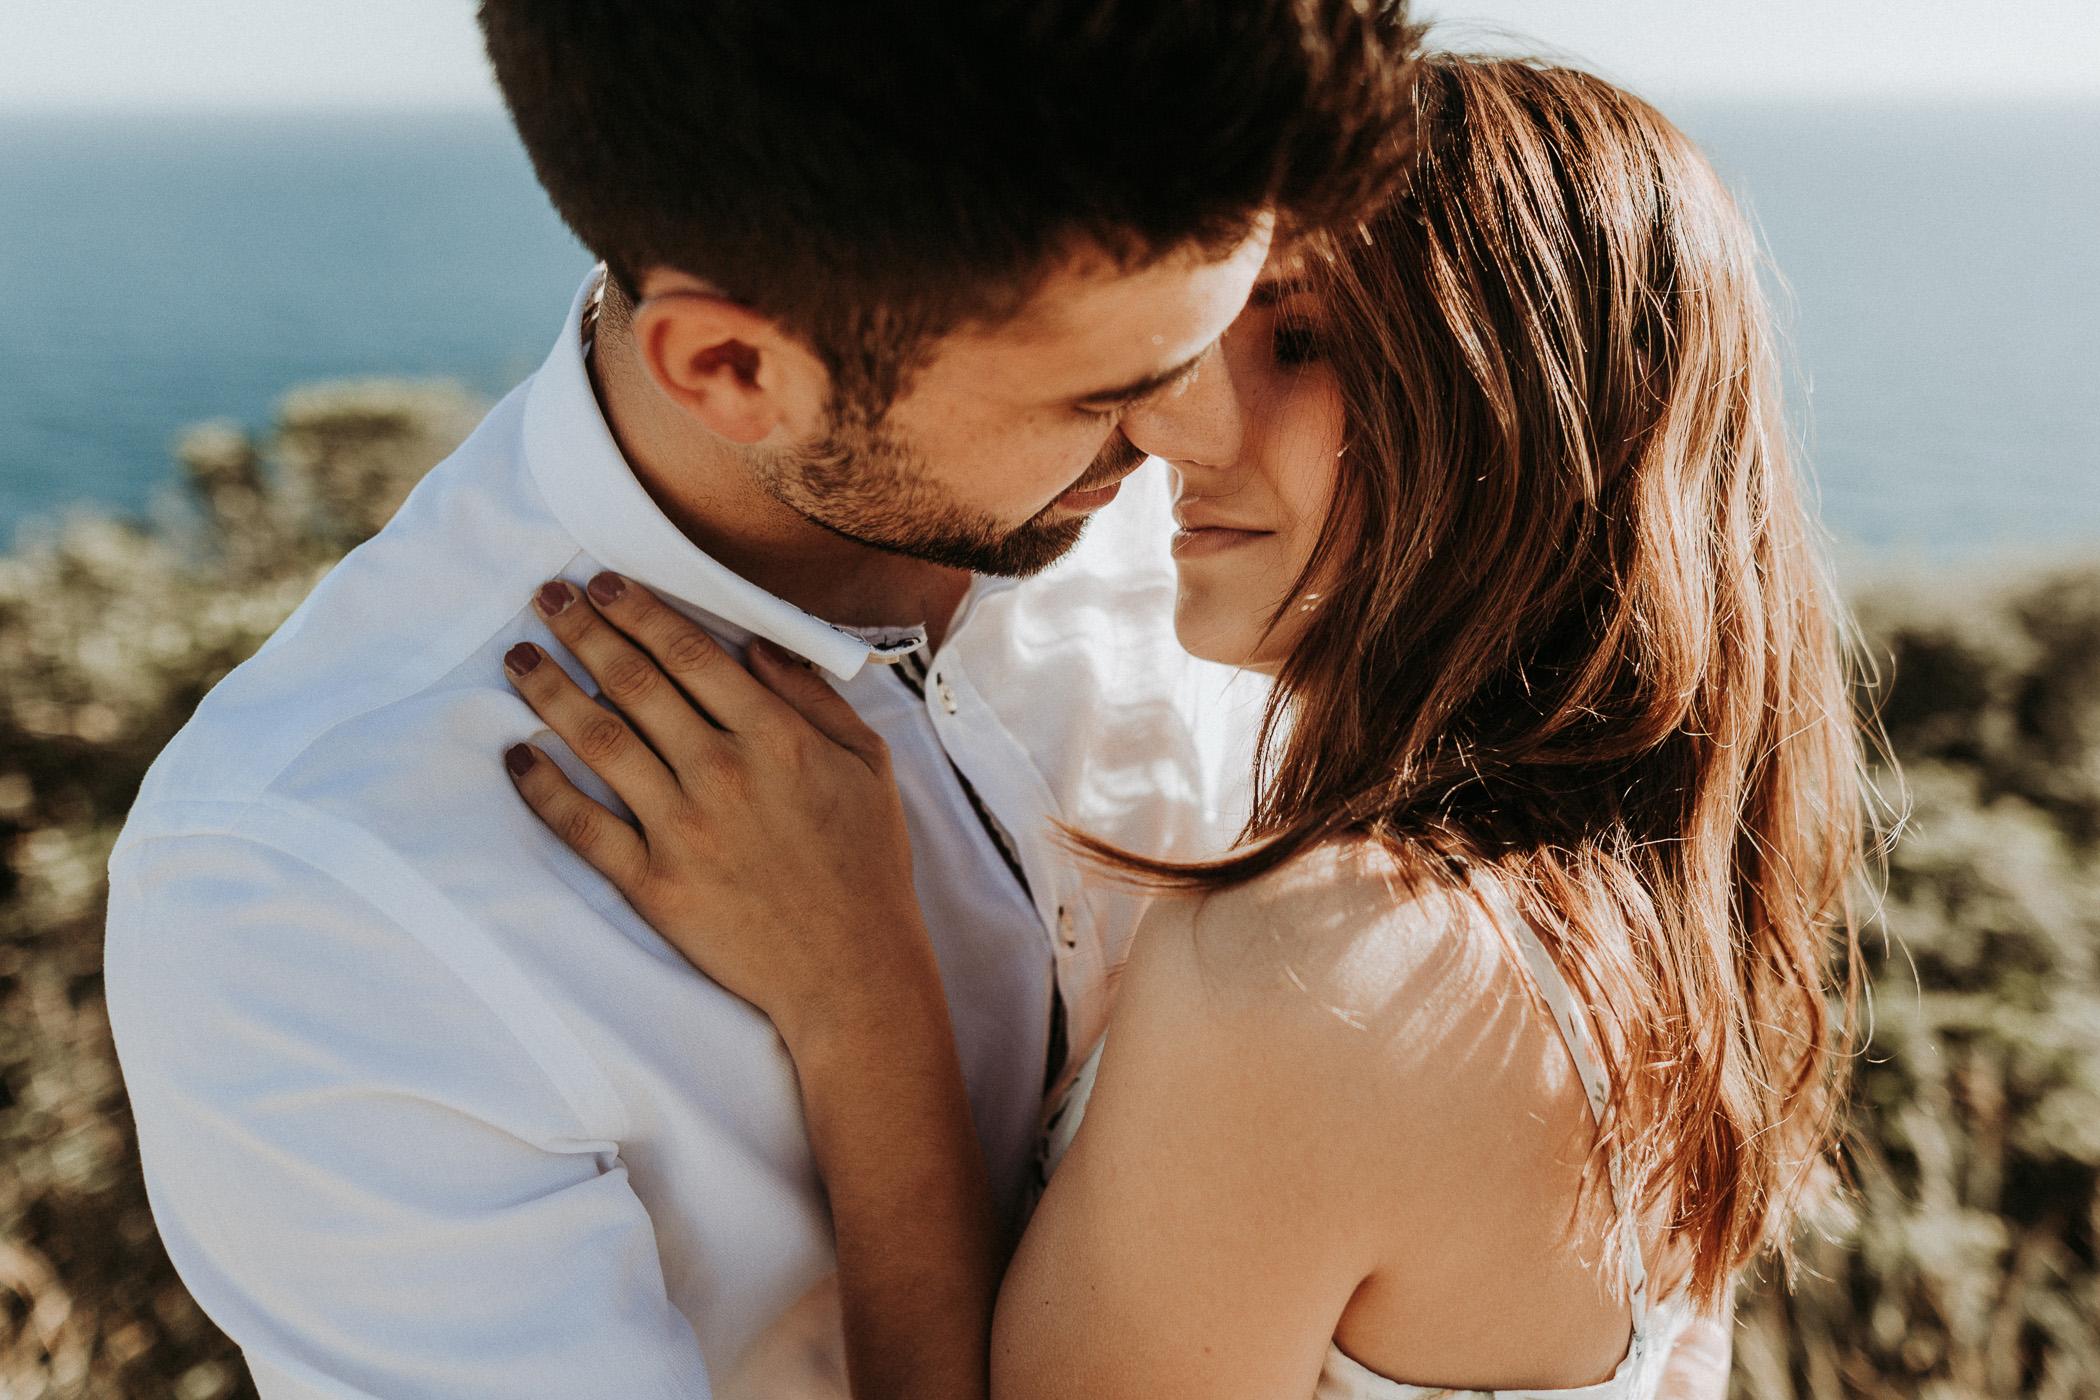 DanielaMarquardtPhotography_wedding_elopement_mallorca_spain_calapi_palma_lauraandtoni_136